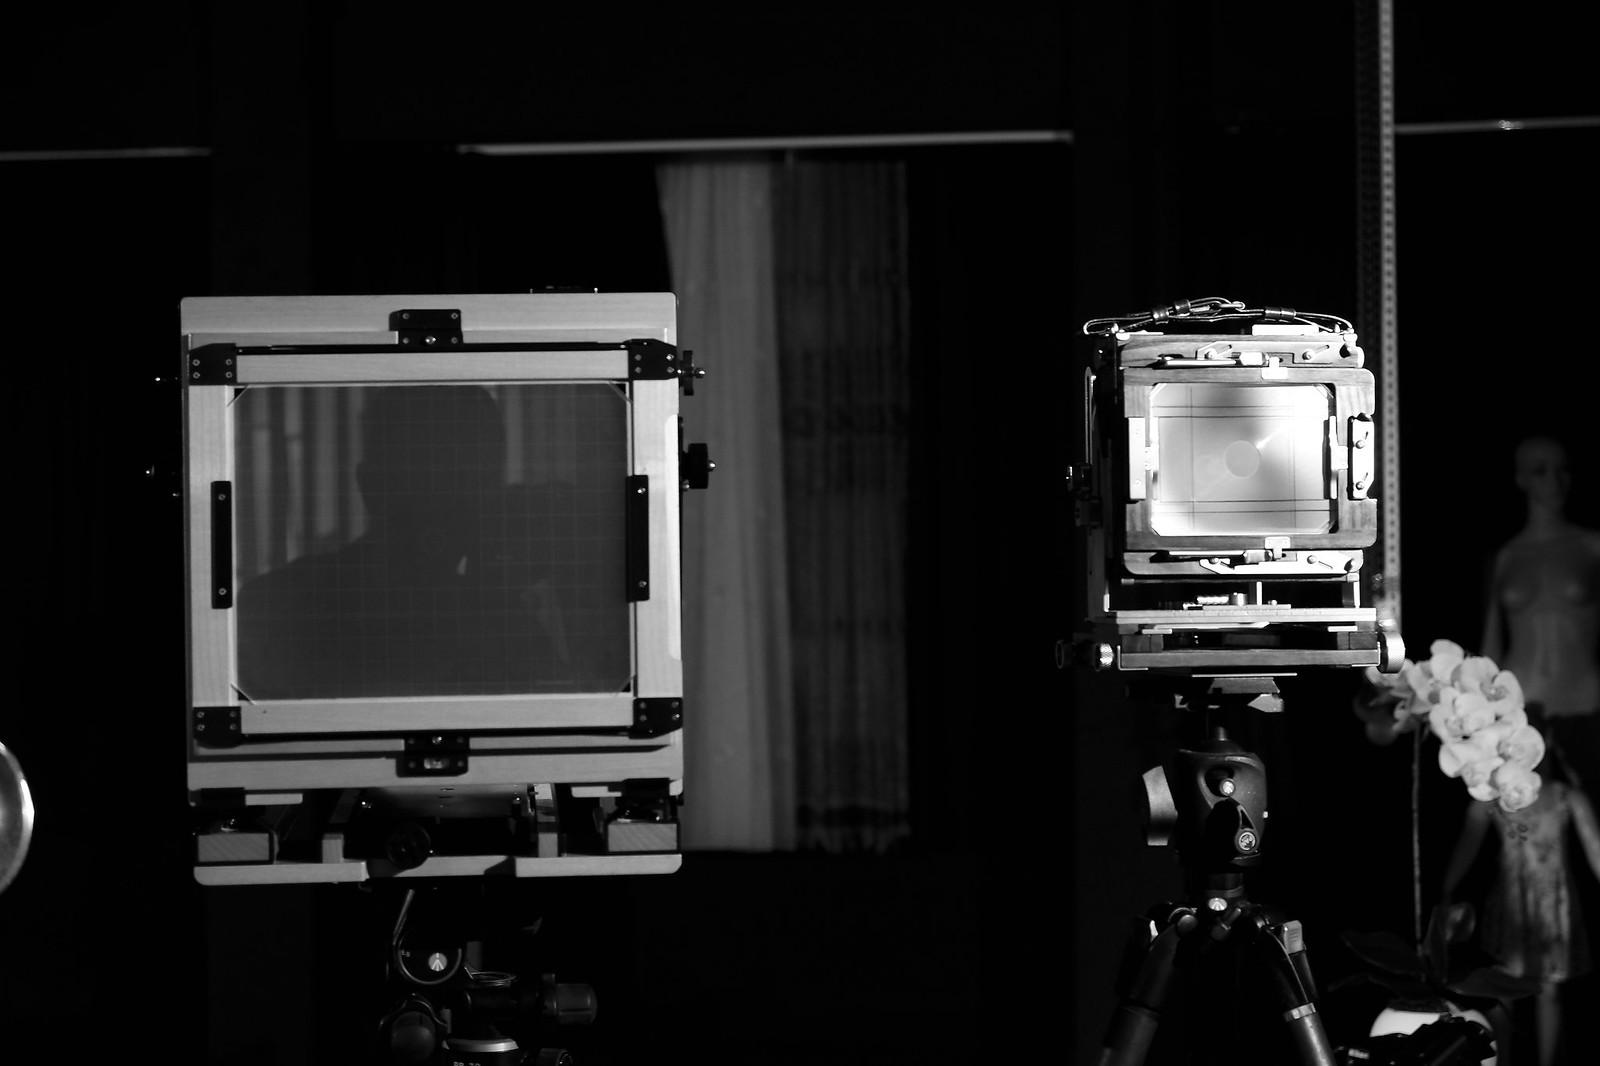 chamonix 8X10 相機開箱